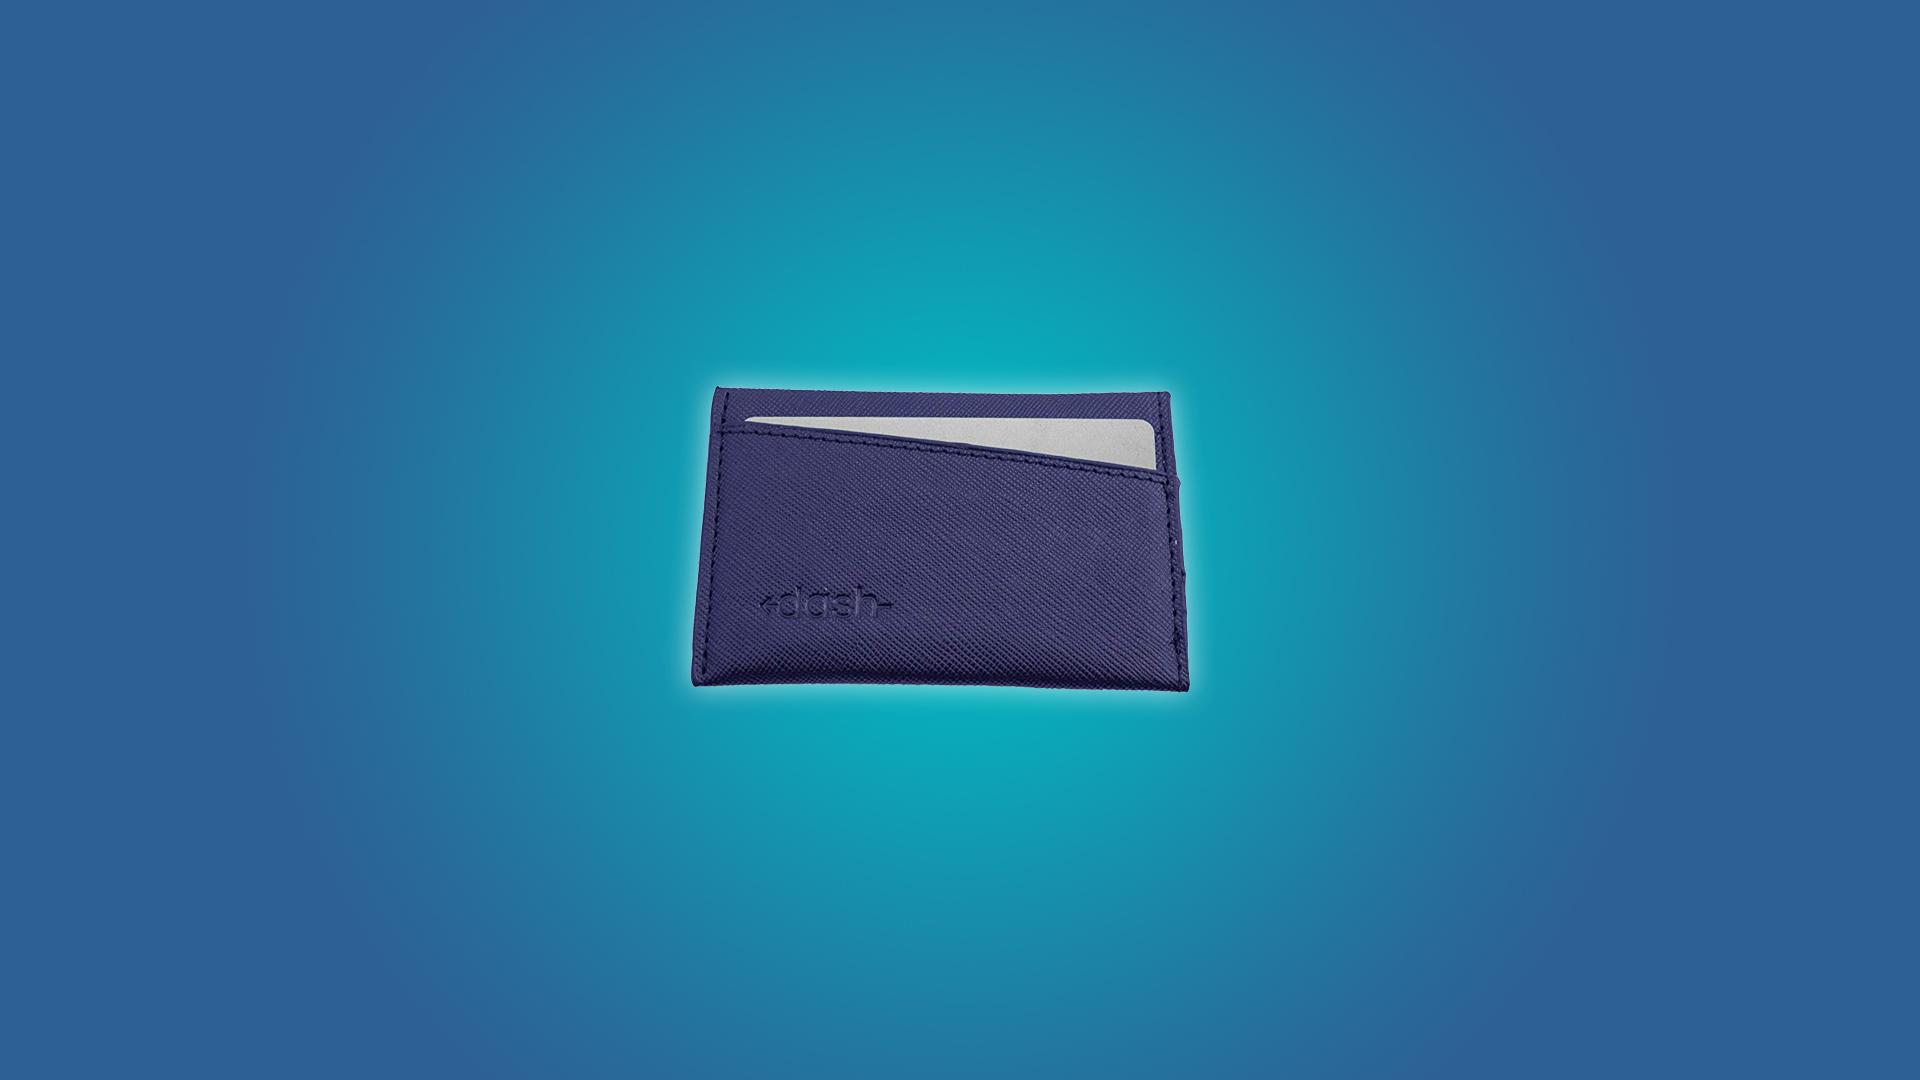 The Dash Premium Slim Wallet